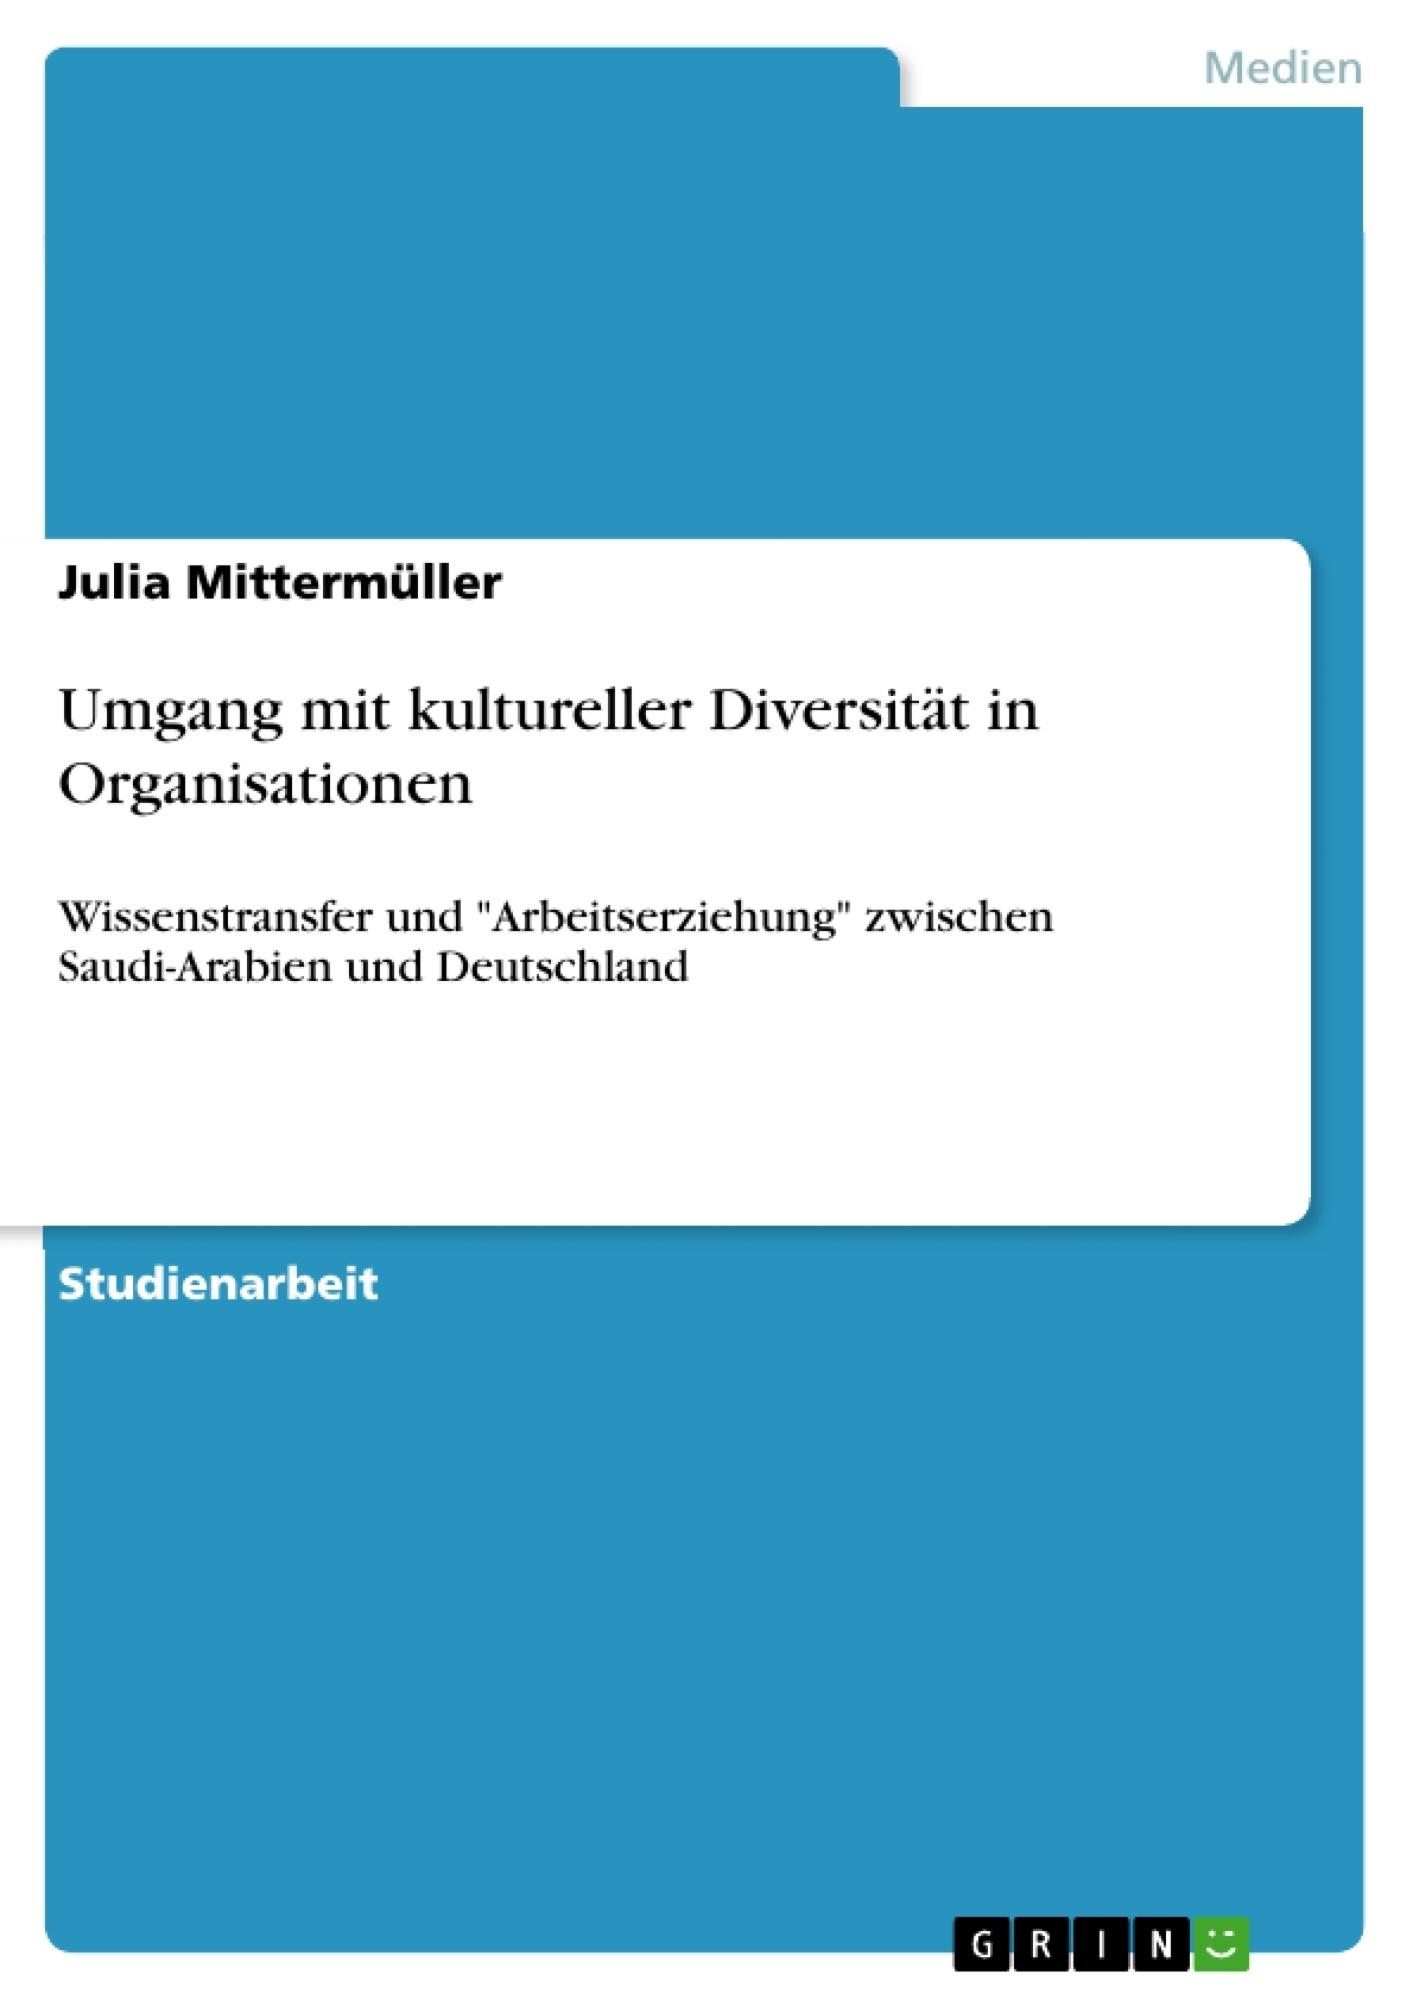 Titel: Umgang mit kultureller Diversität in Organisationen